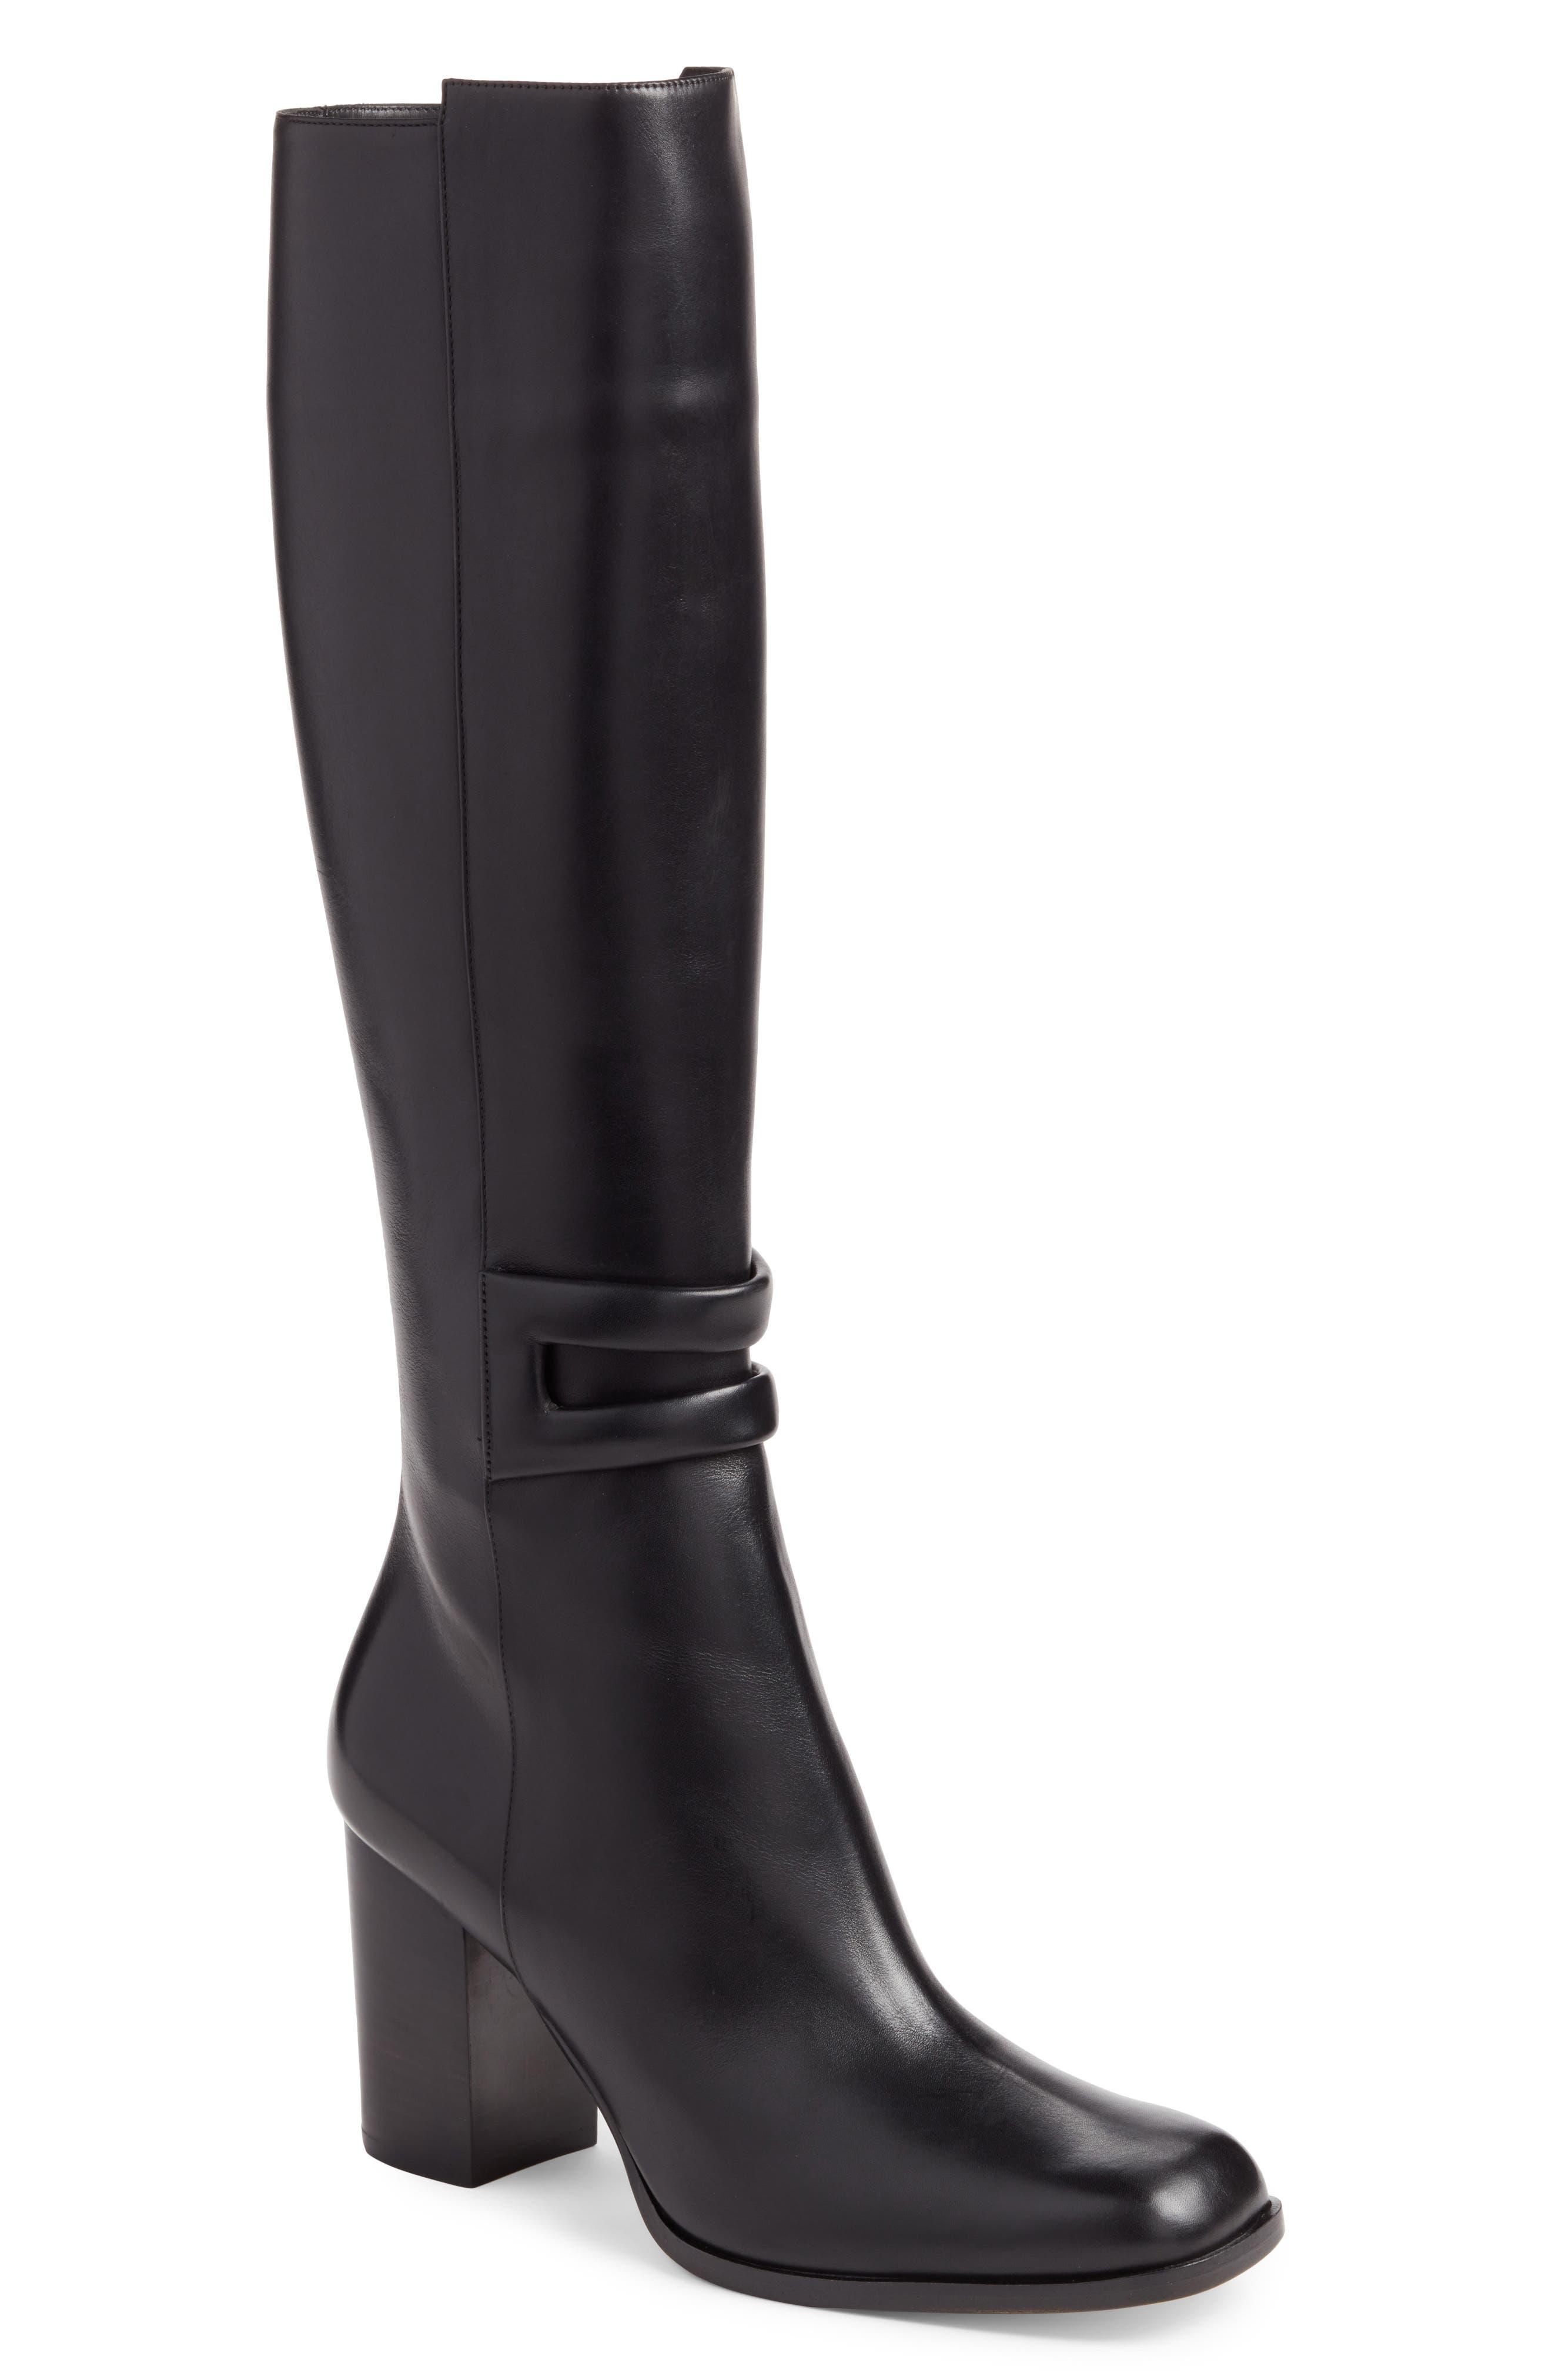 Loewe Knee High Boot (Women)